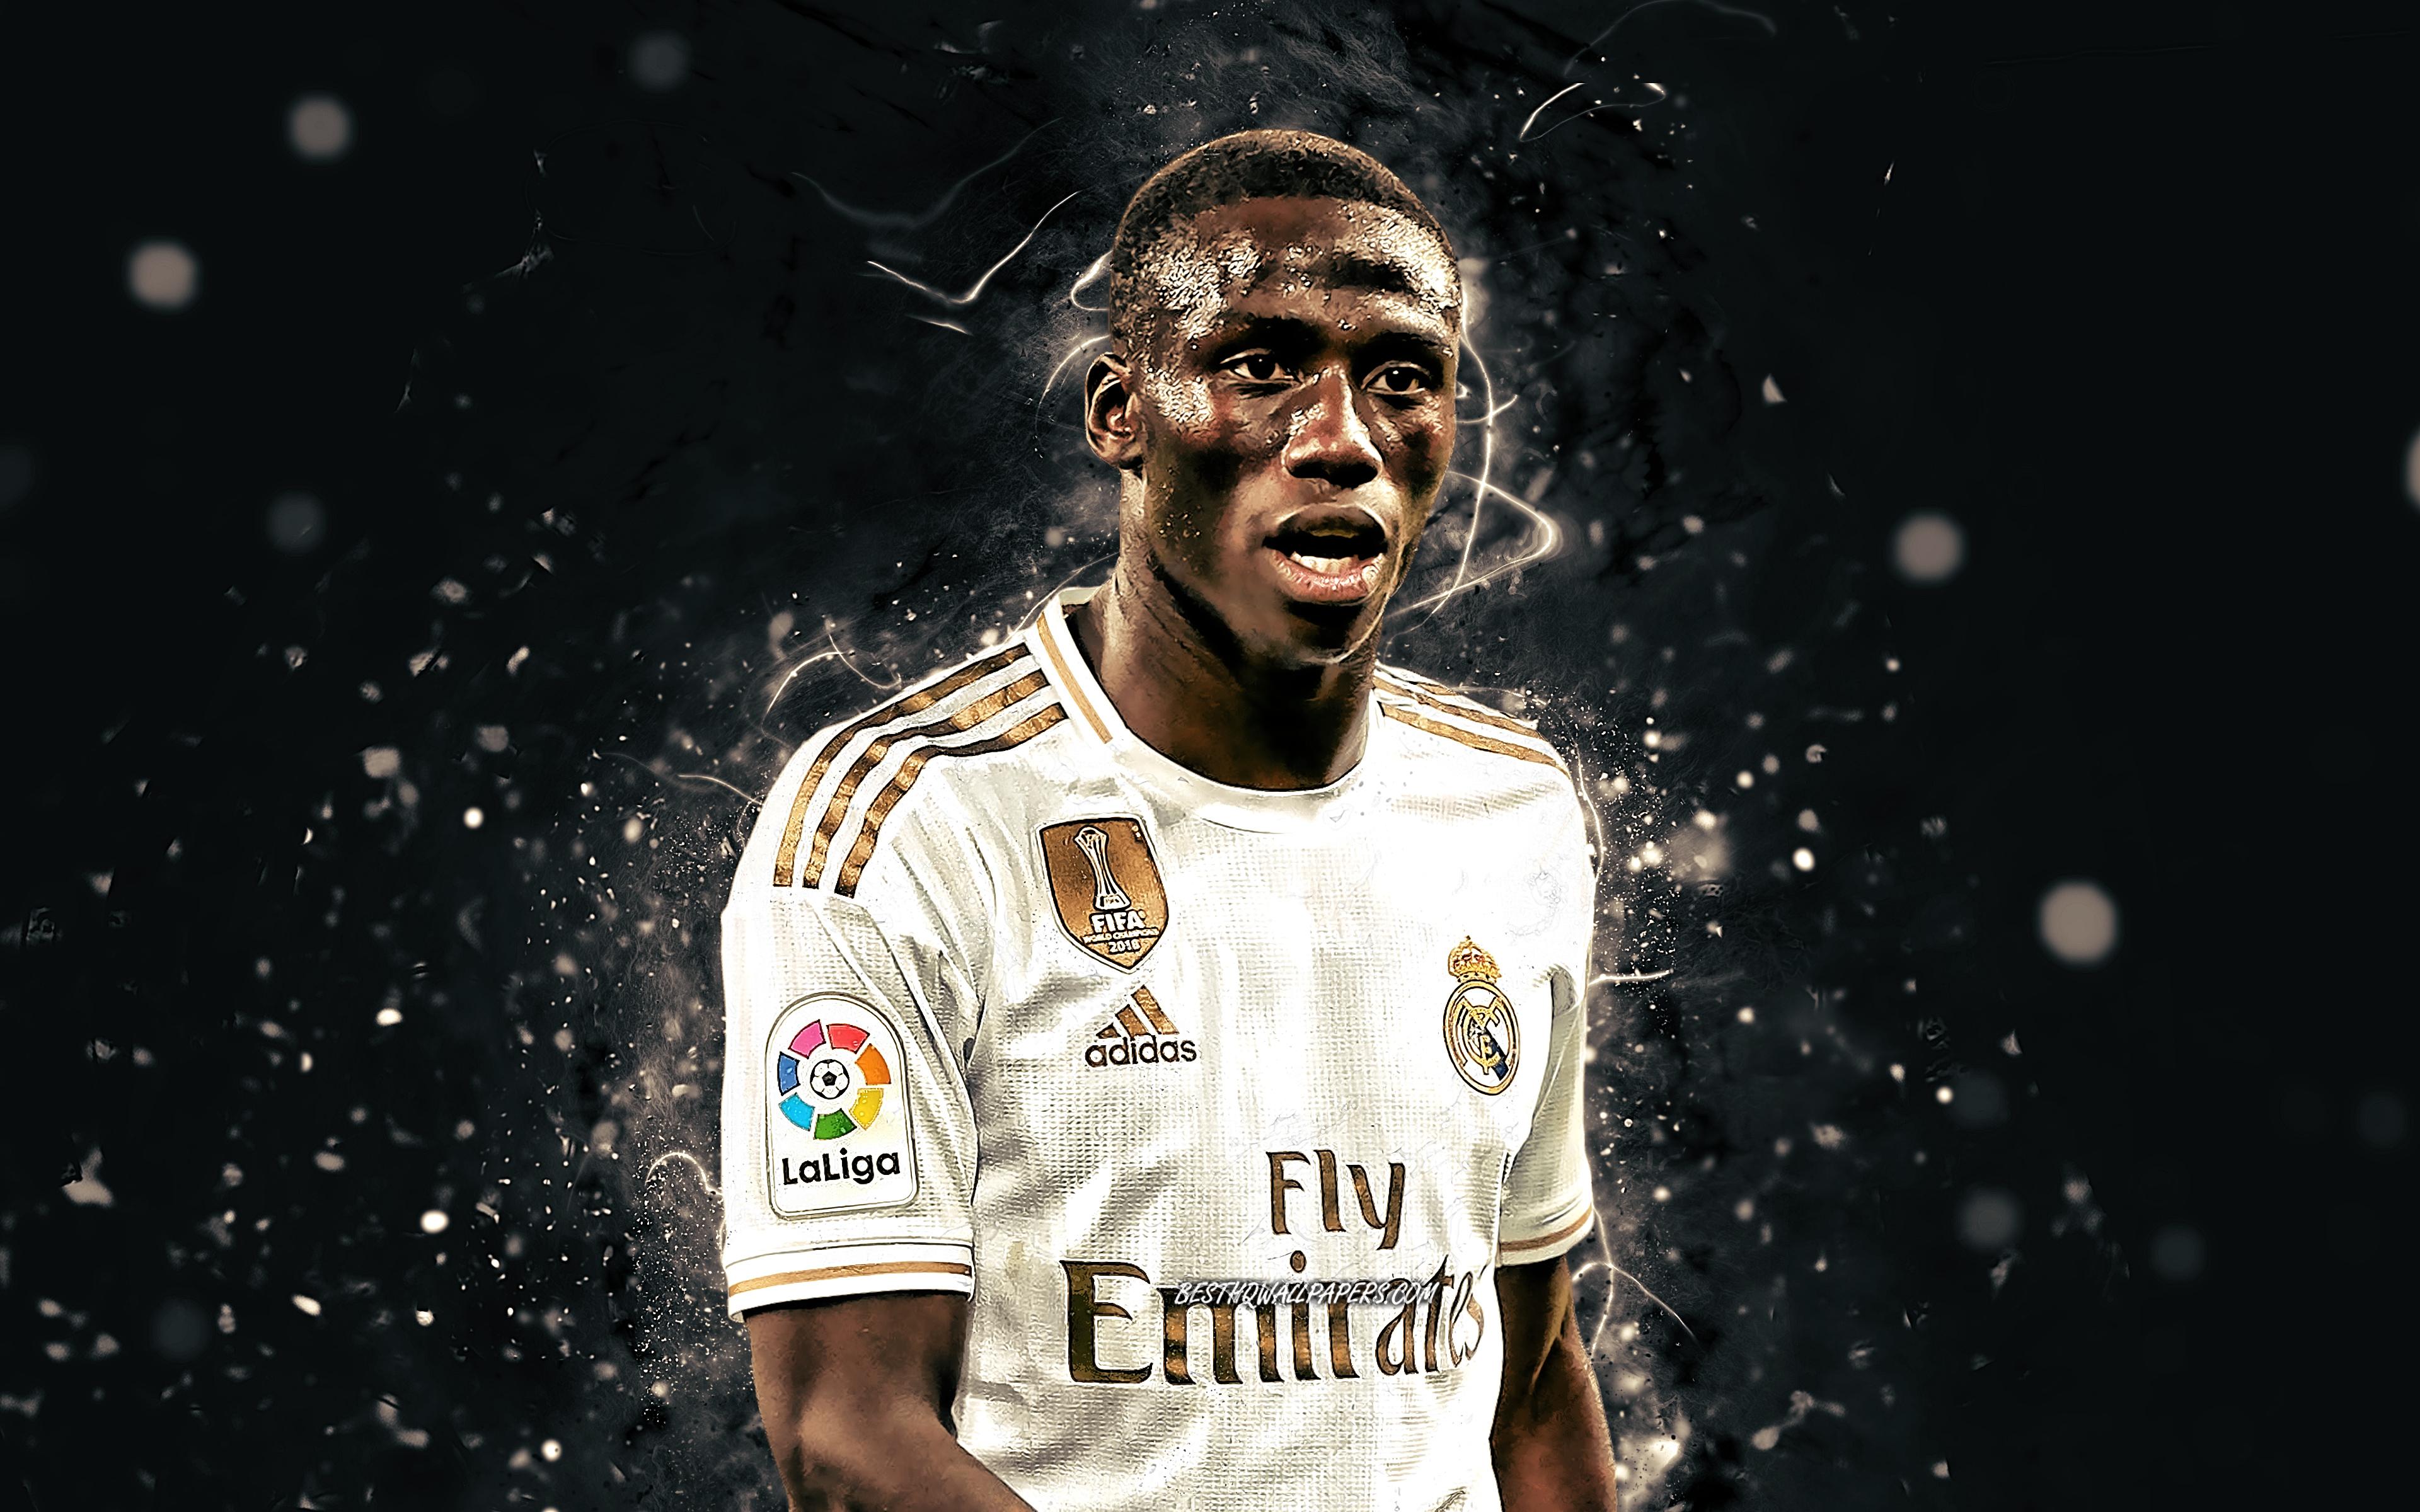 Download wallpapers Ferland Mendy 4k 2020 Real Madrid FC 3840x2400